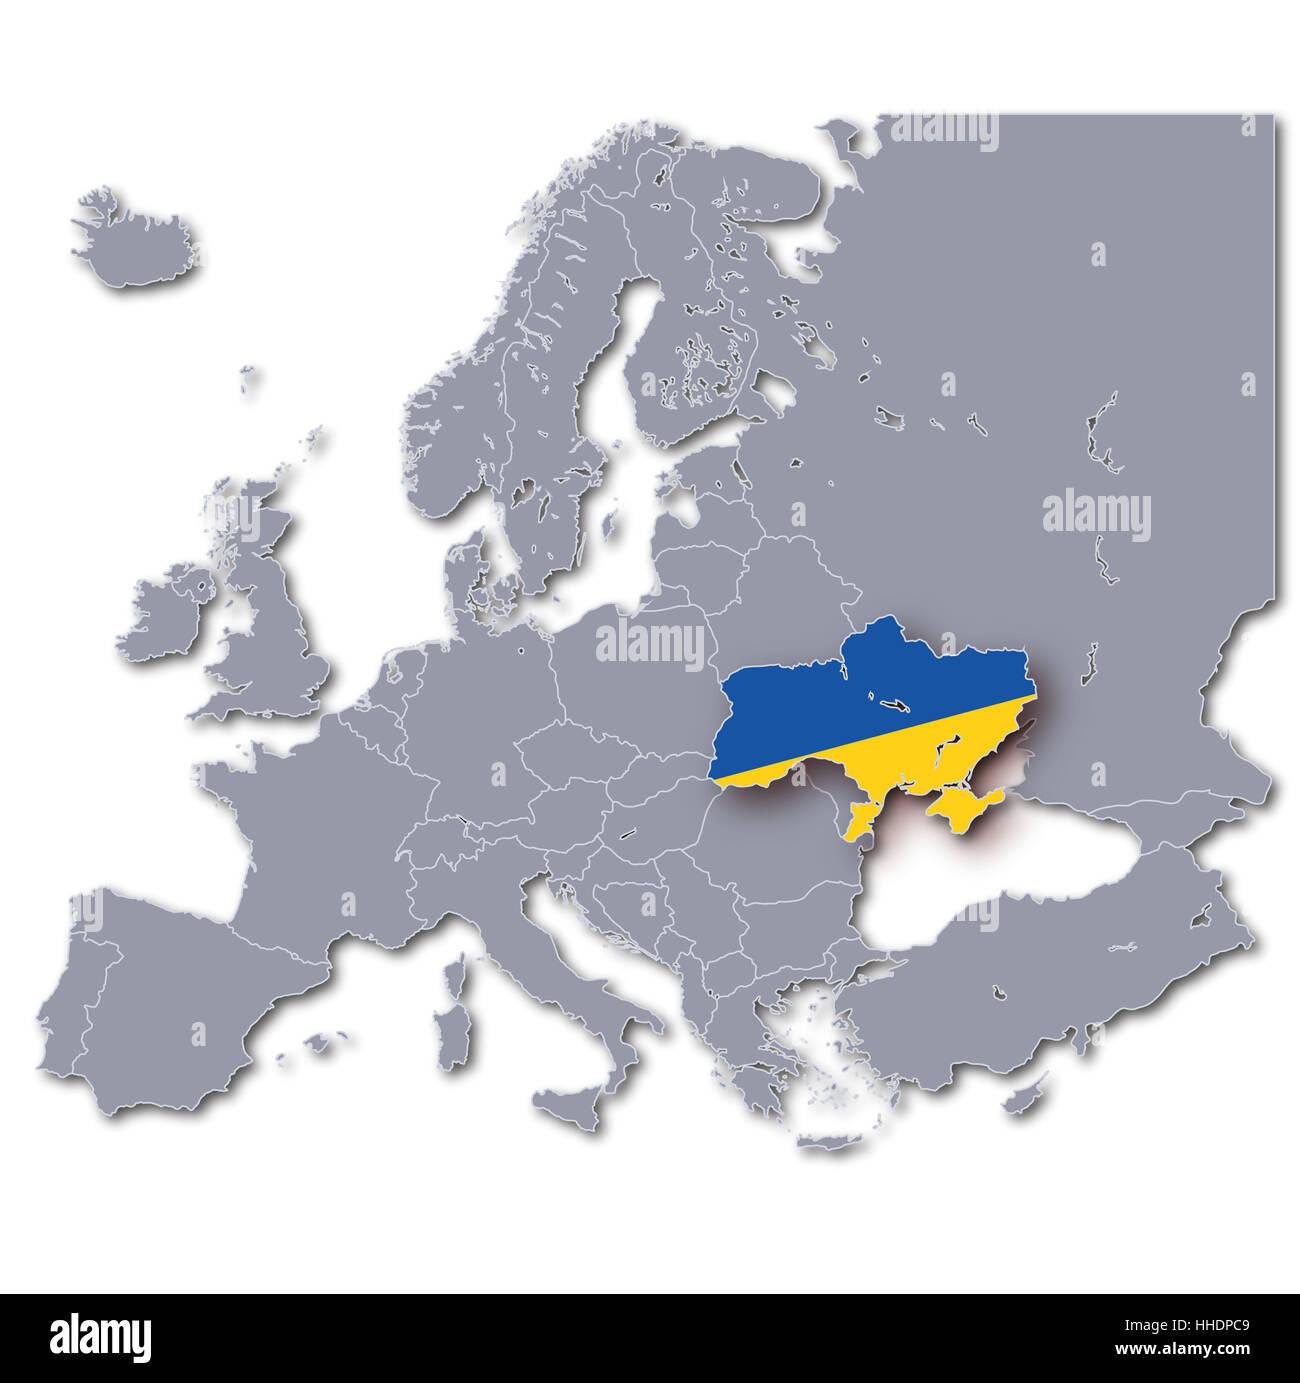 ukraine on a map of europe Map Of Europe Ukraine Stock Photo Alamy